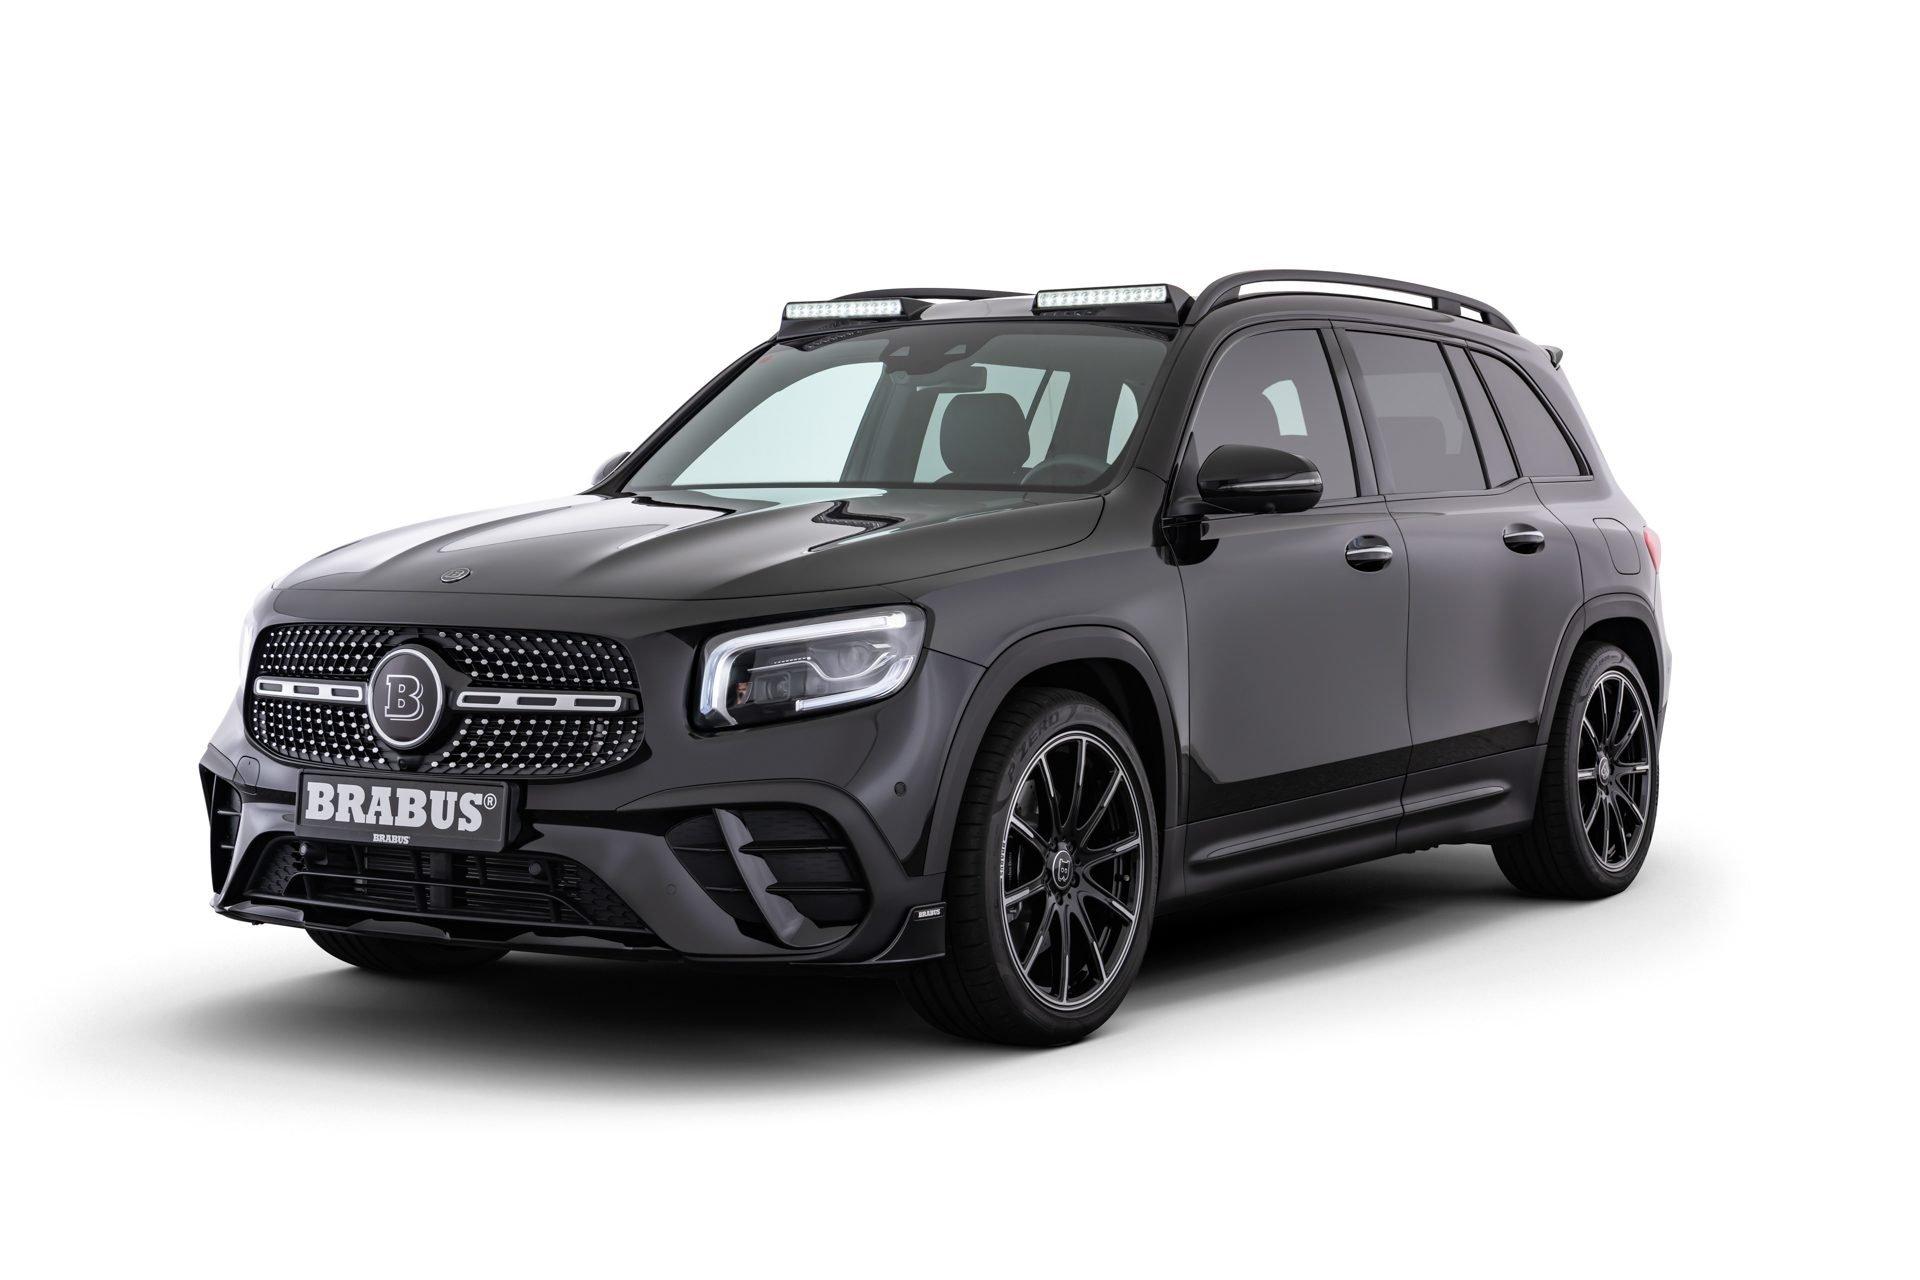 2020 Mercedes-Benz GLB Brabus